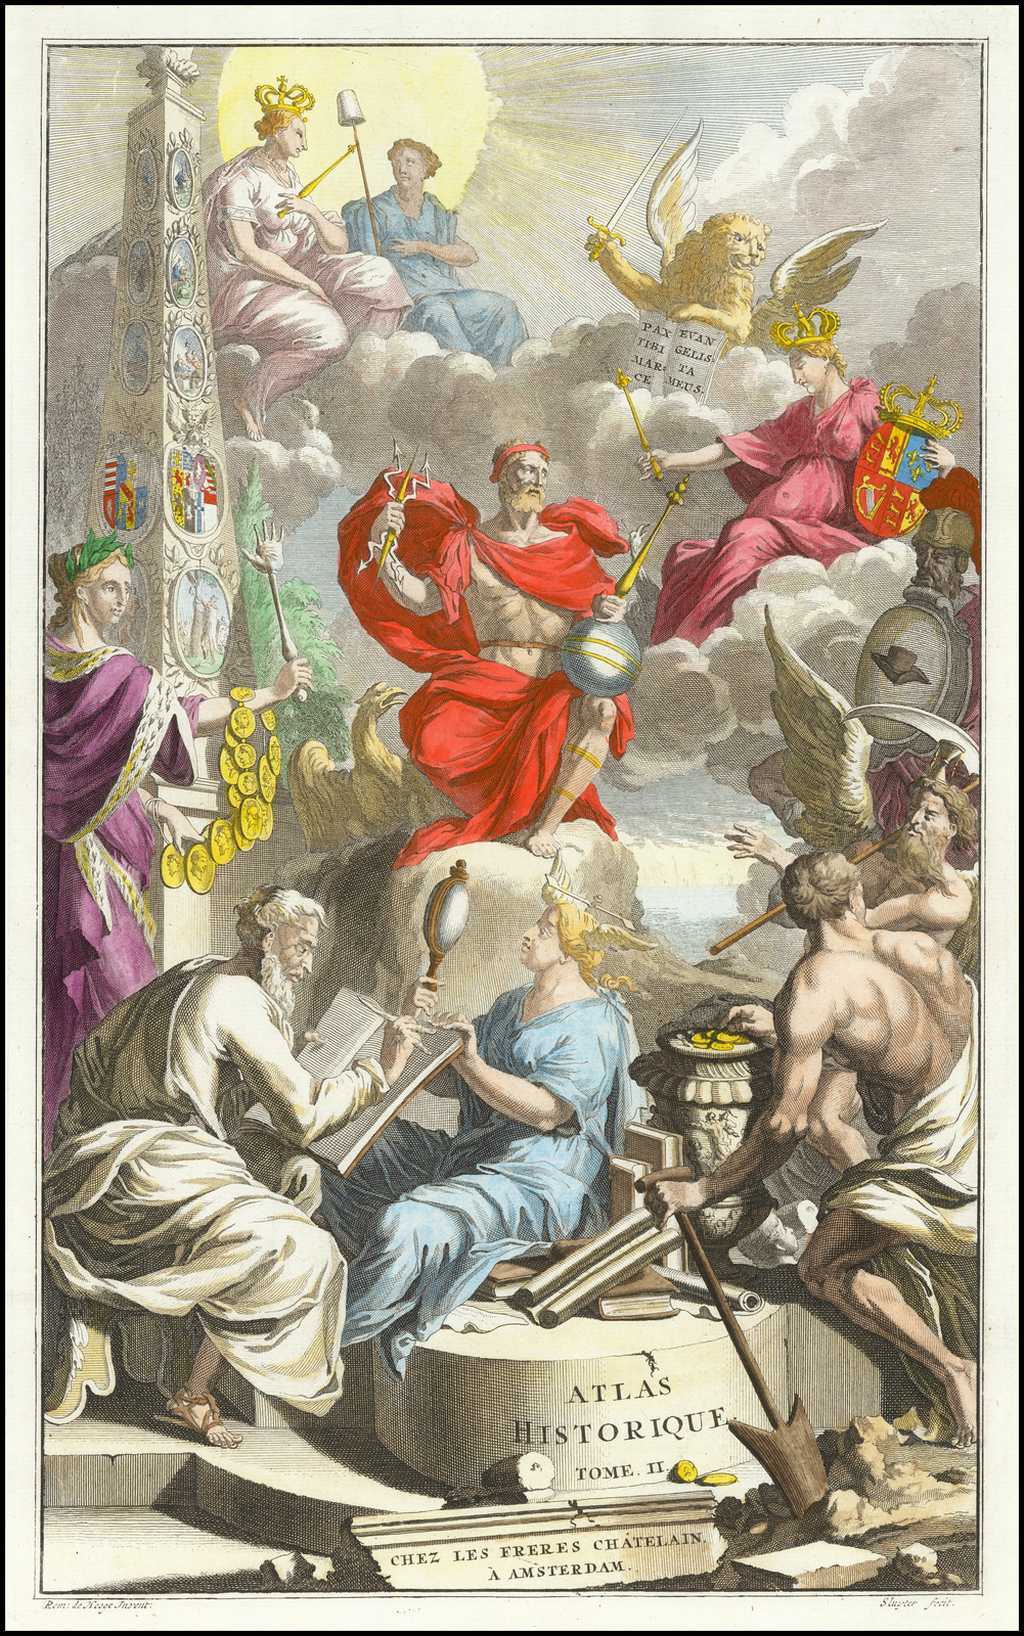 [Title Page] Atlas Historique  Tome. II By Henri Chatelain